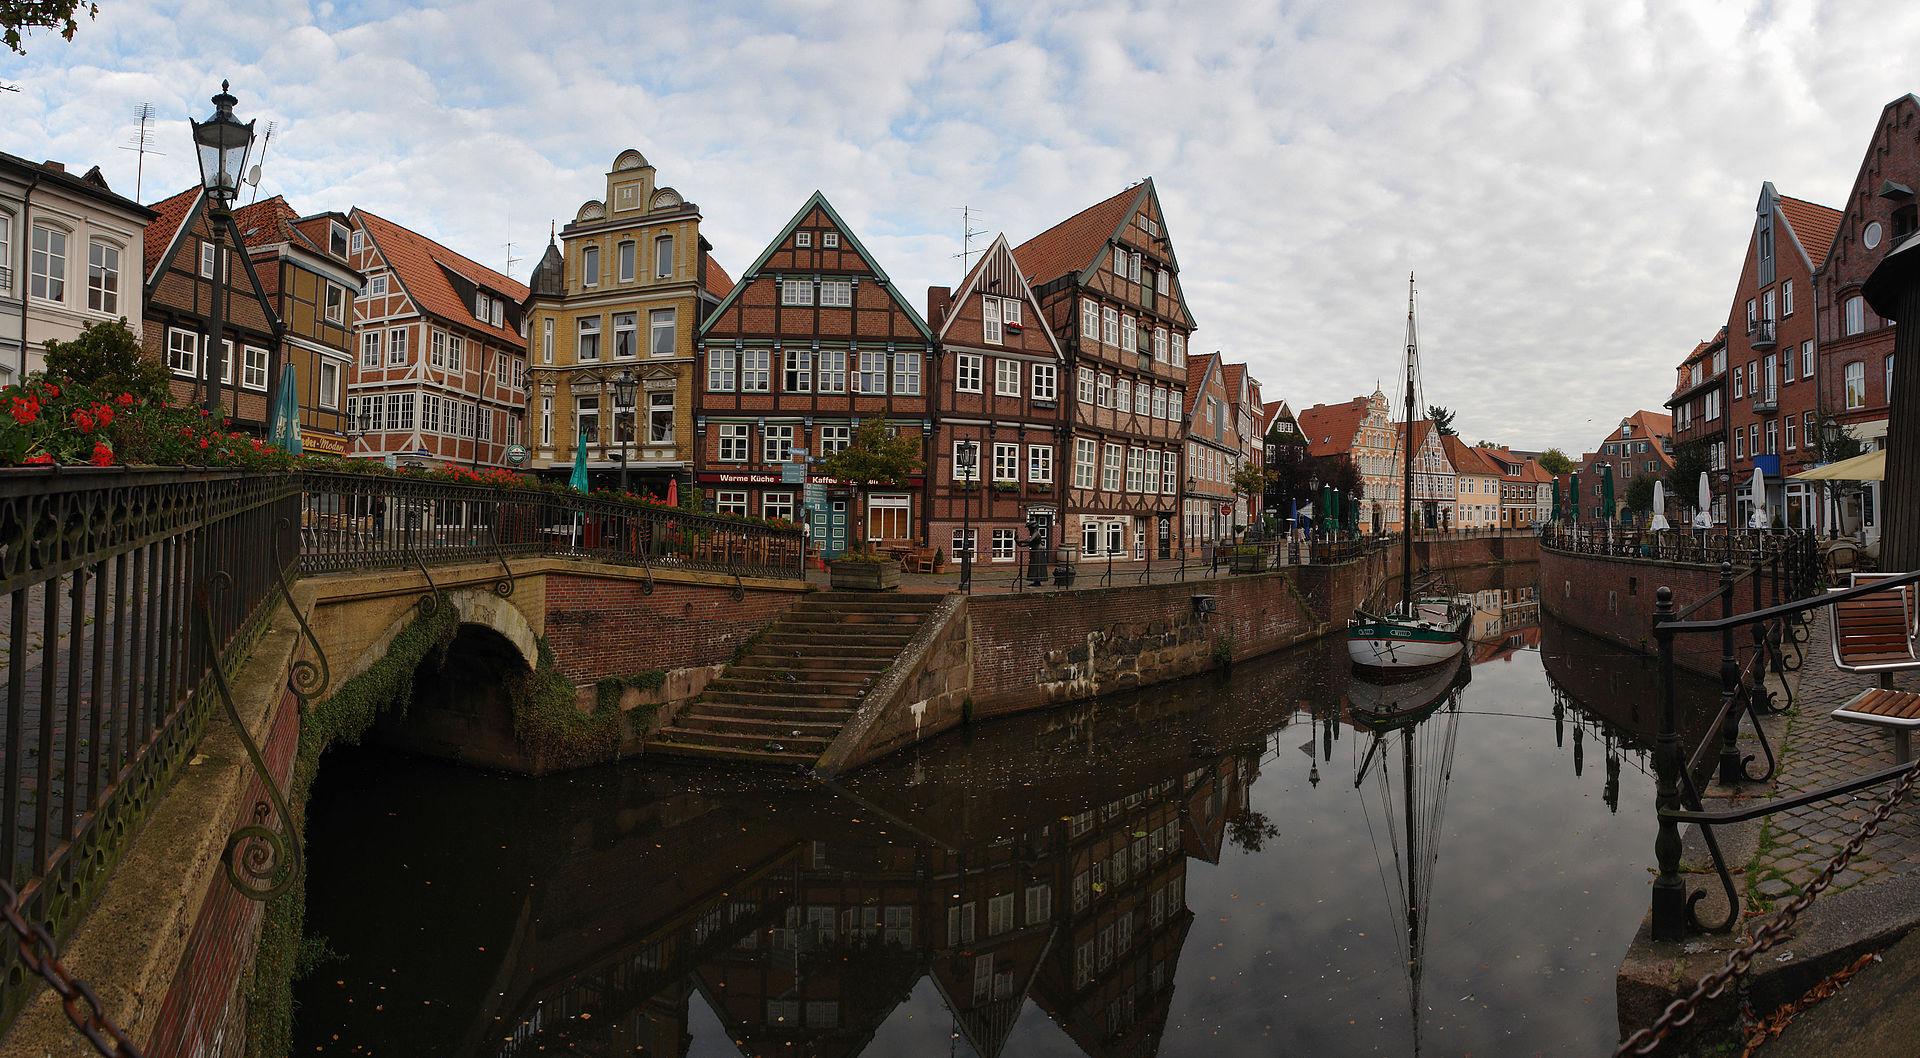 Fast wie in Holland: Hansehäuser in Stade. (CC BY-SA 3.0 Wikimedia)